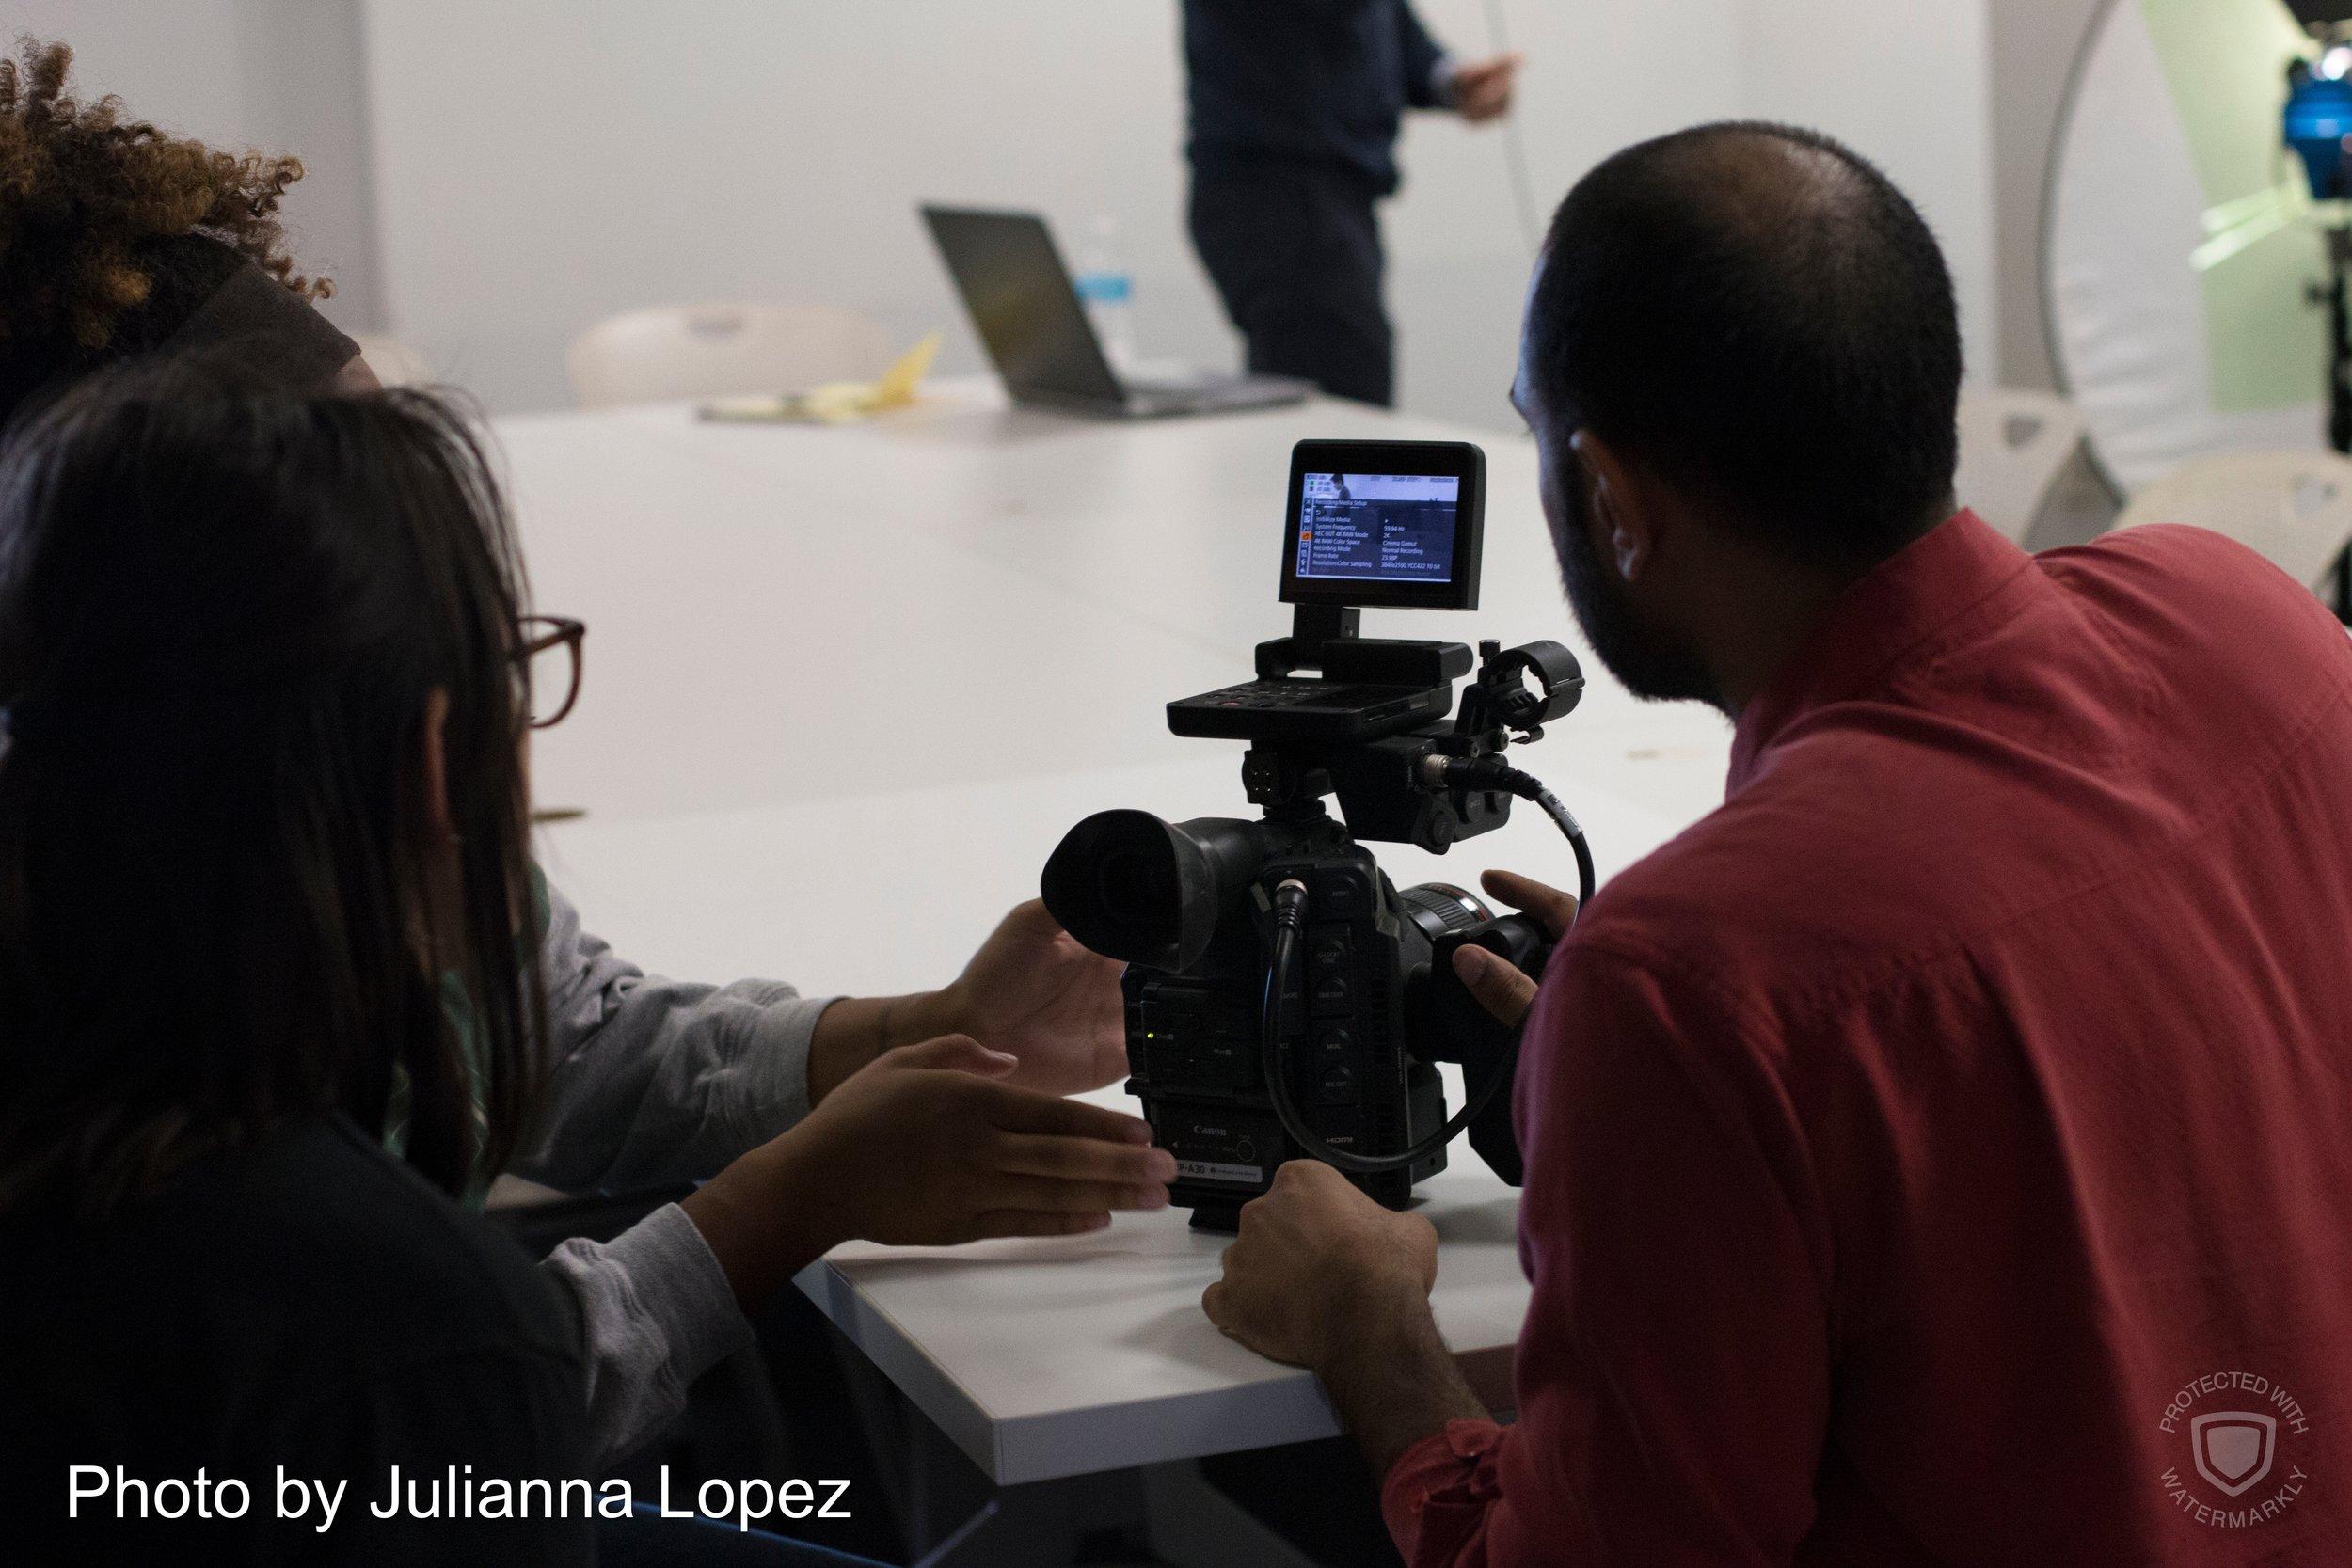 Julianna Lopez - IMG_6262.jpg